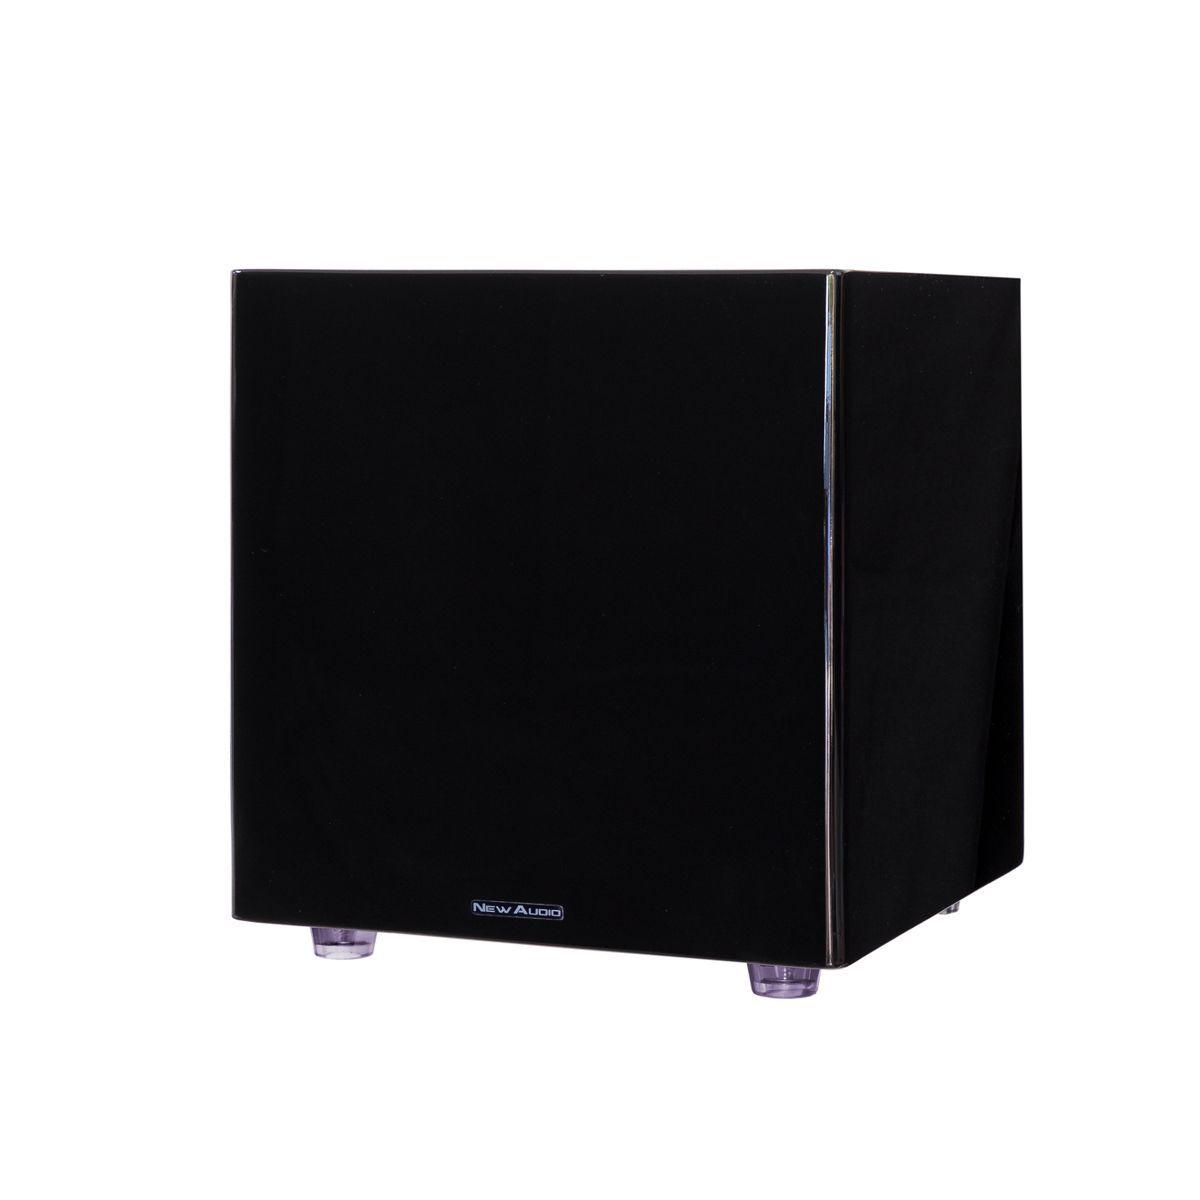 "Subwoofer Ativo 12"" 200W RMS Clean Design Black Piano SUB200 12 New Audio"